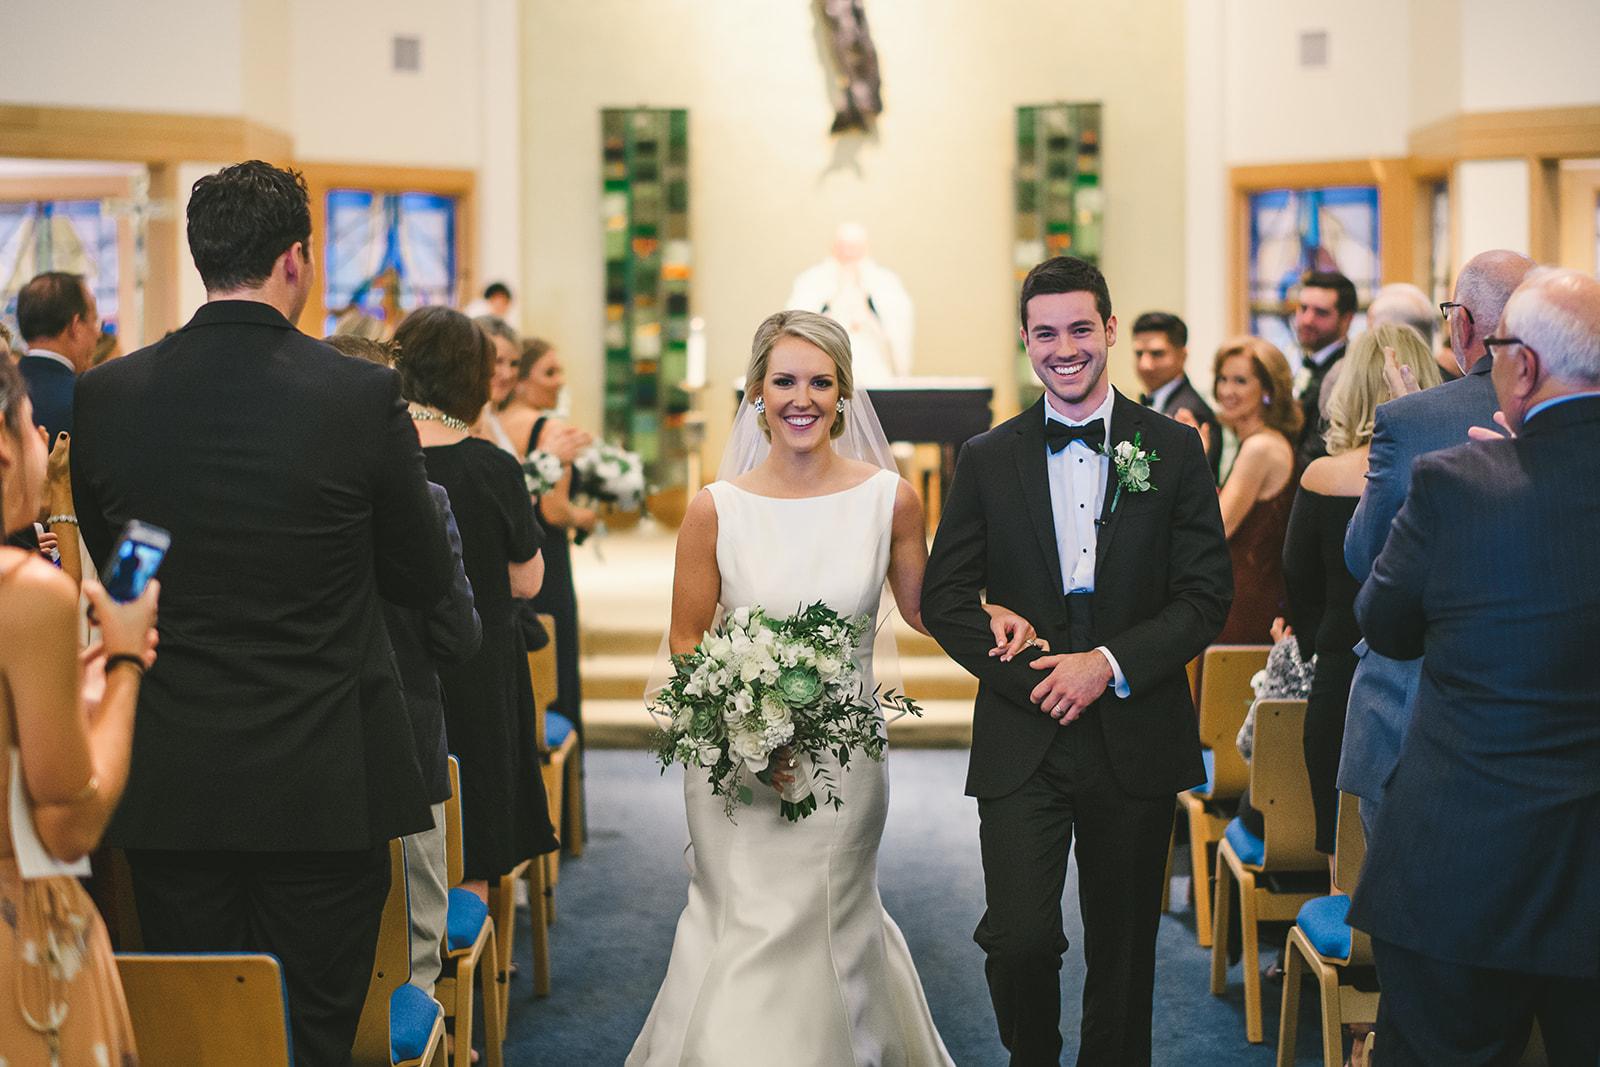 7 bride and groom fairfield university egan chapel wedding.jpg